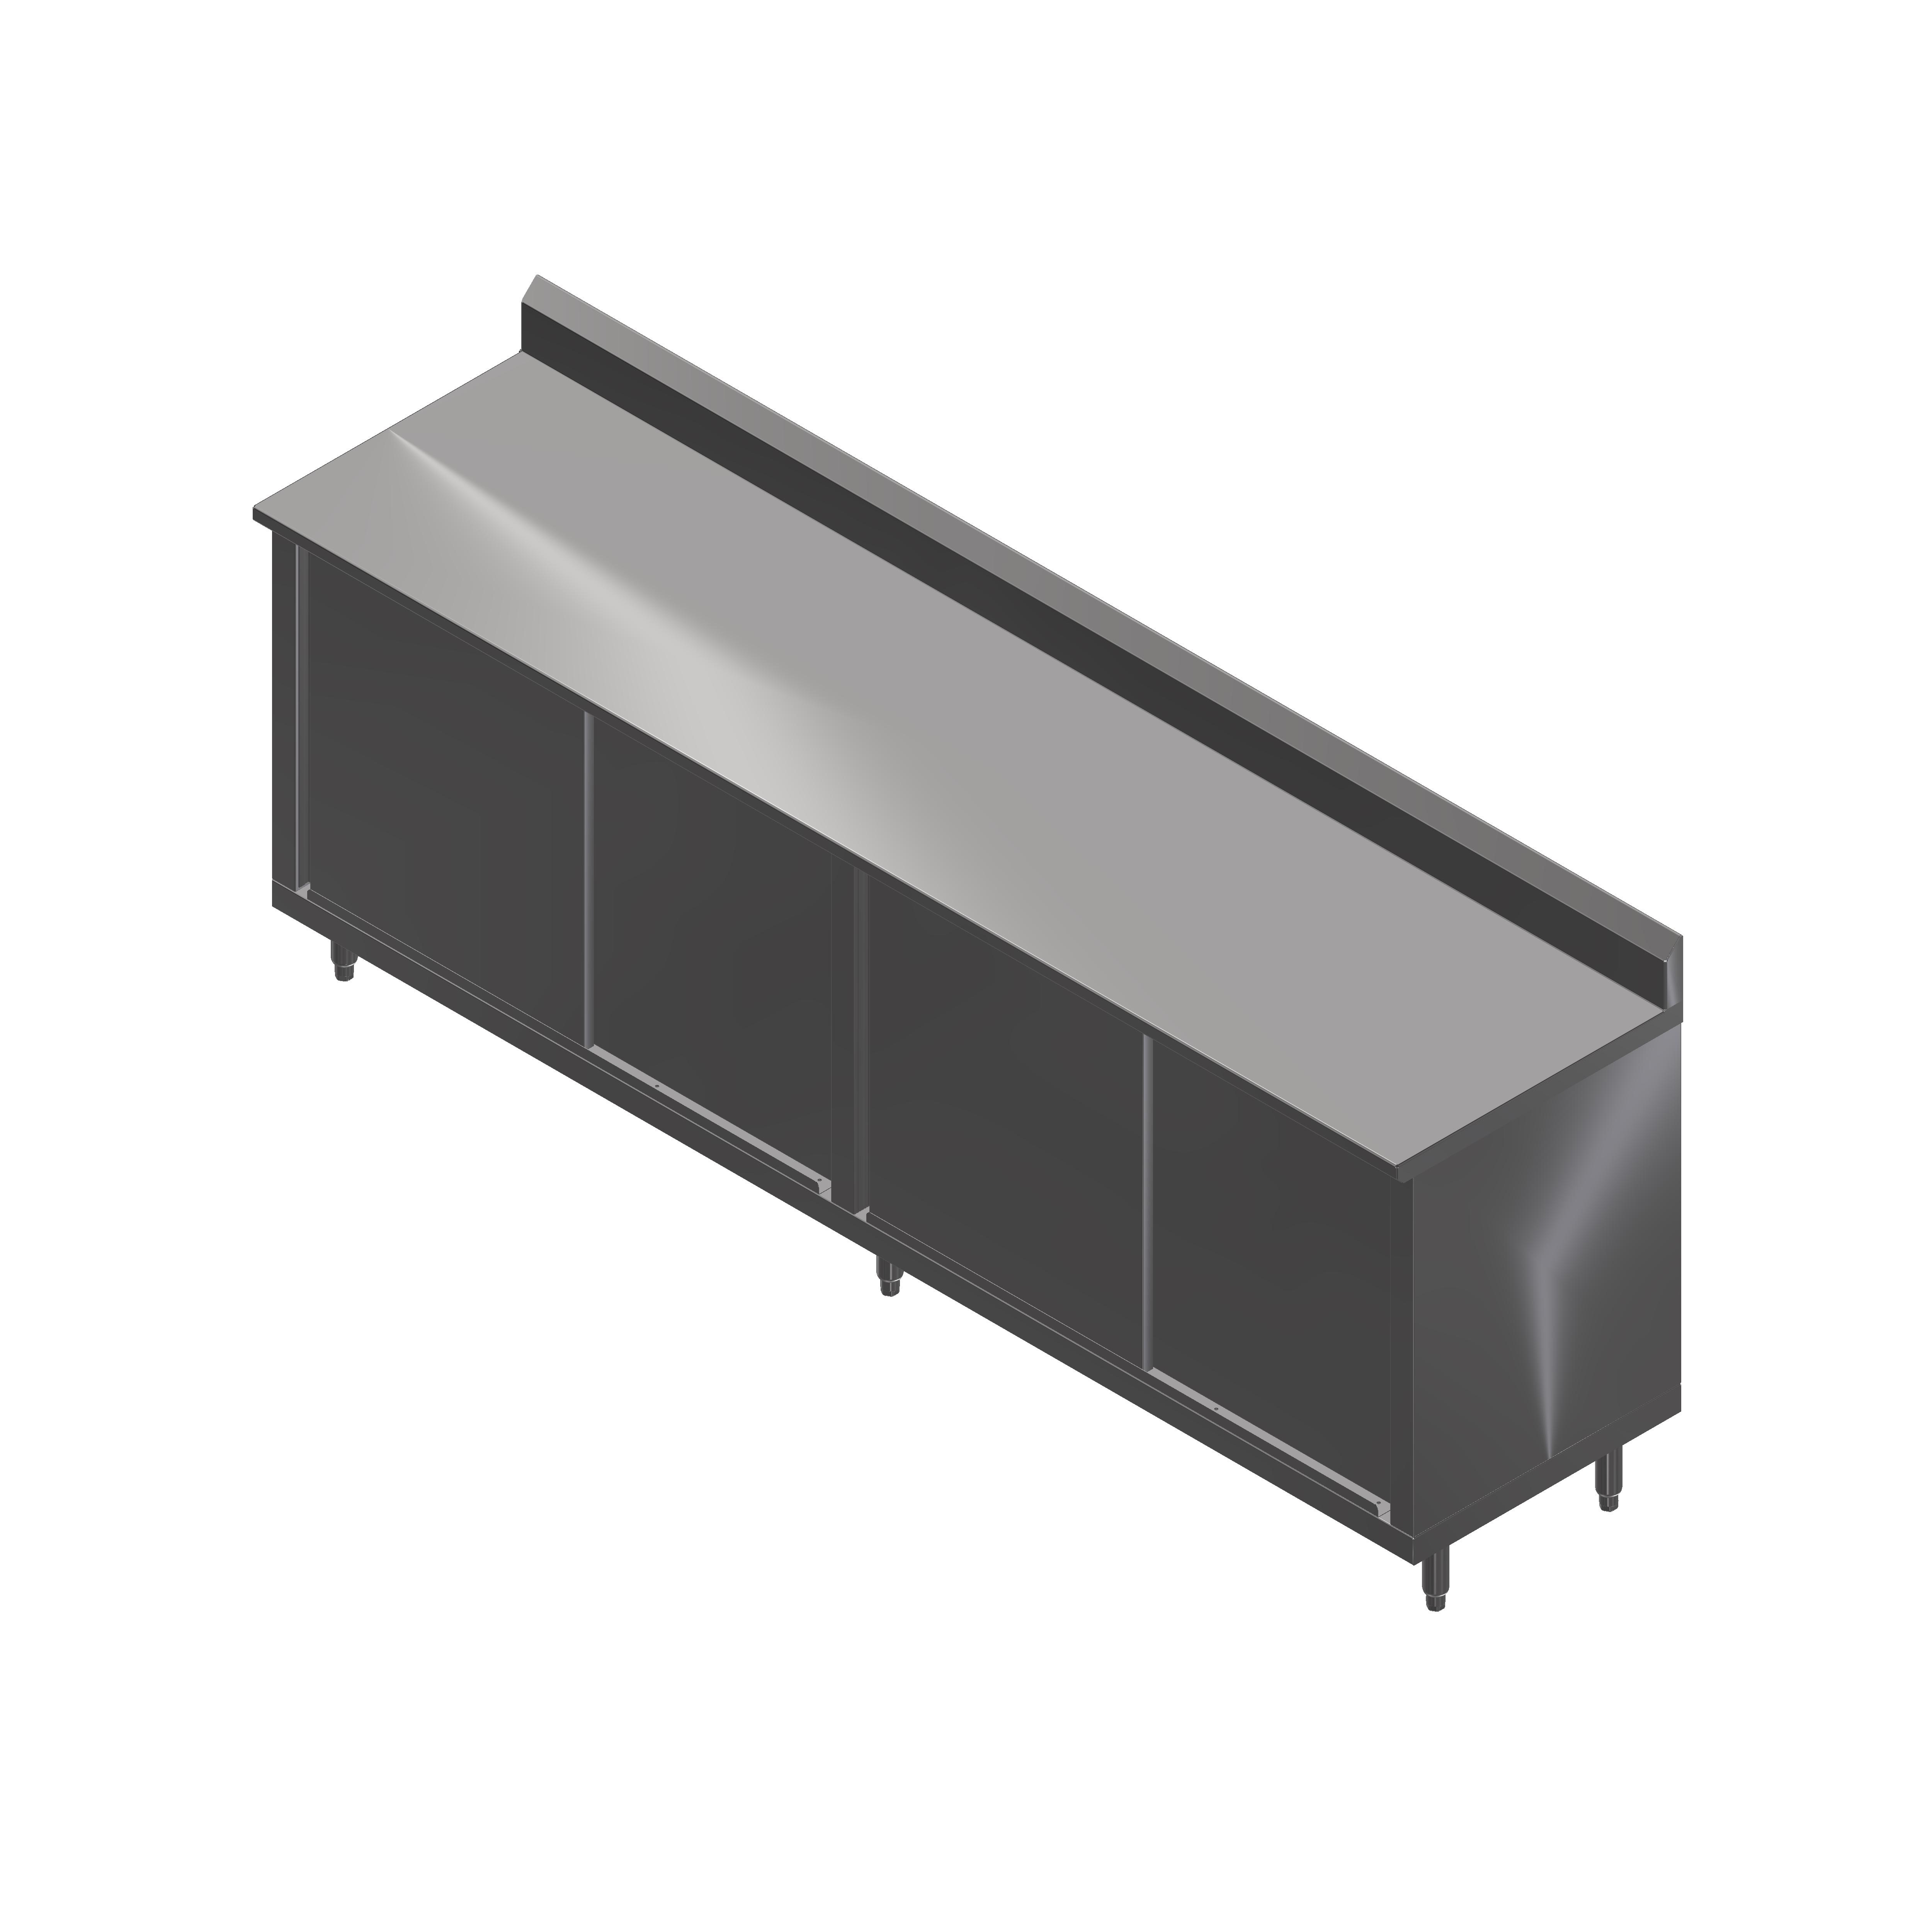 John Boos 4CS4R5-2484 work table, cabinet base sliding doors